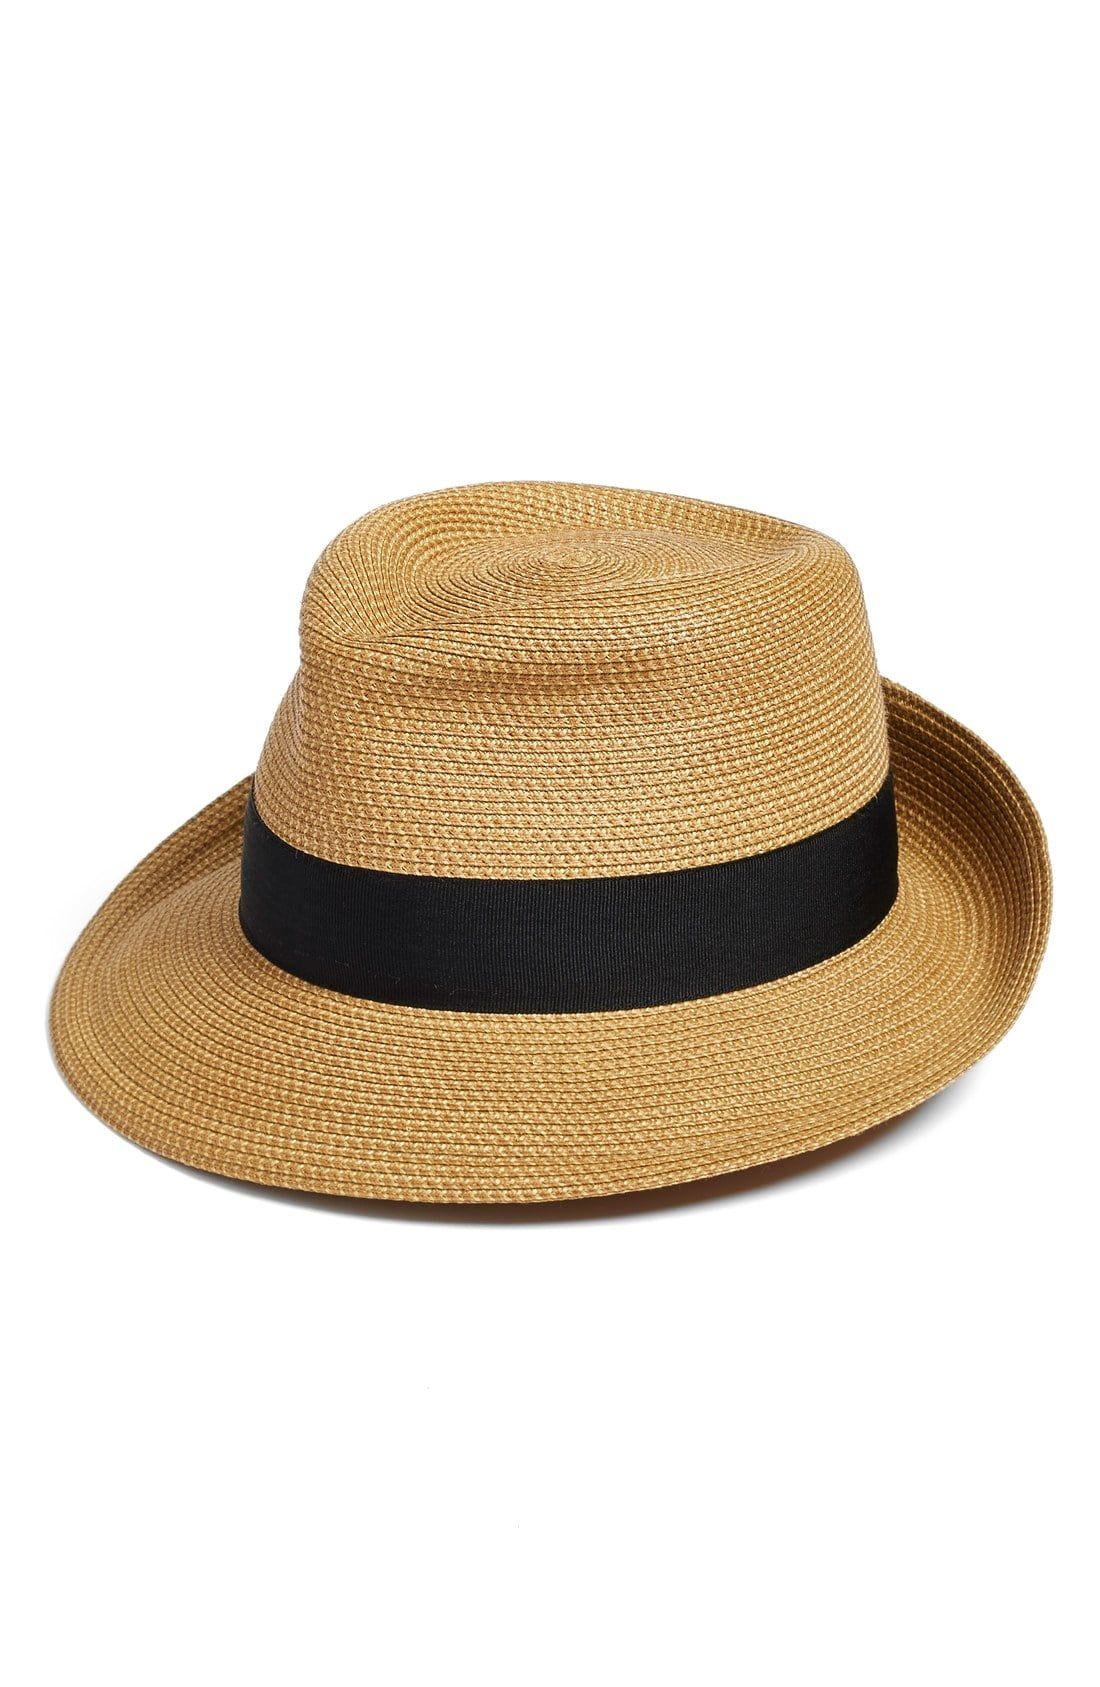 3199fbec240ac Women s Eric Javits Classic Squishee Packable Fedora Sun Hat - Ivory ...